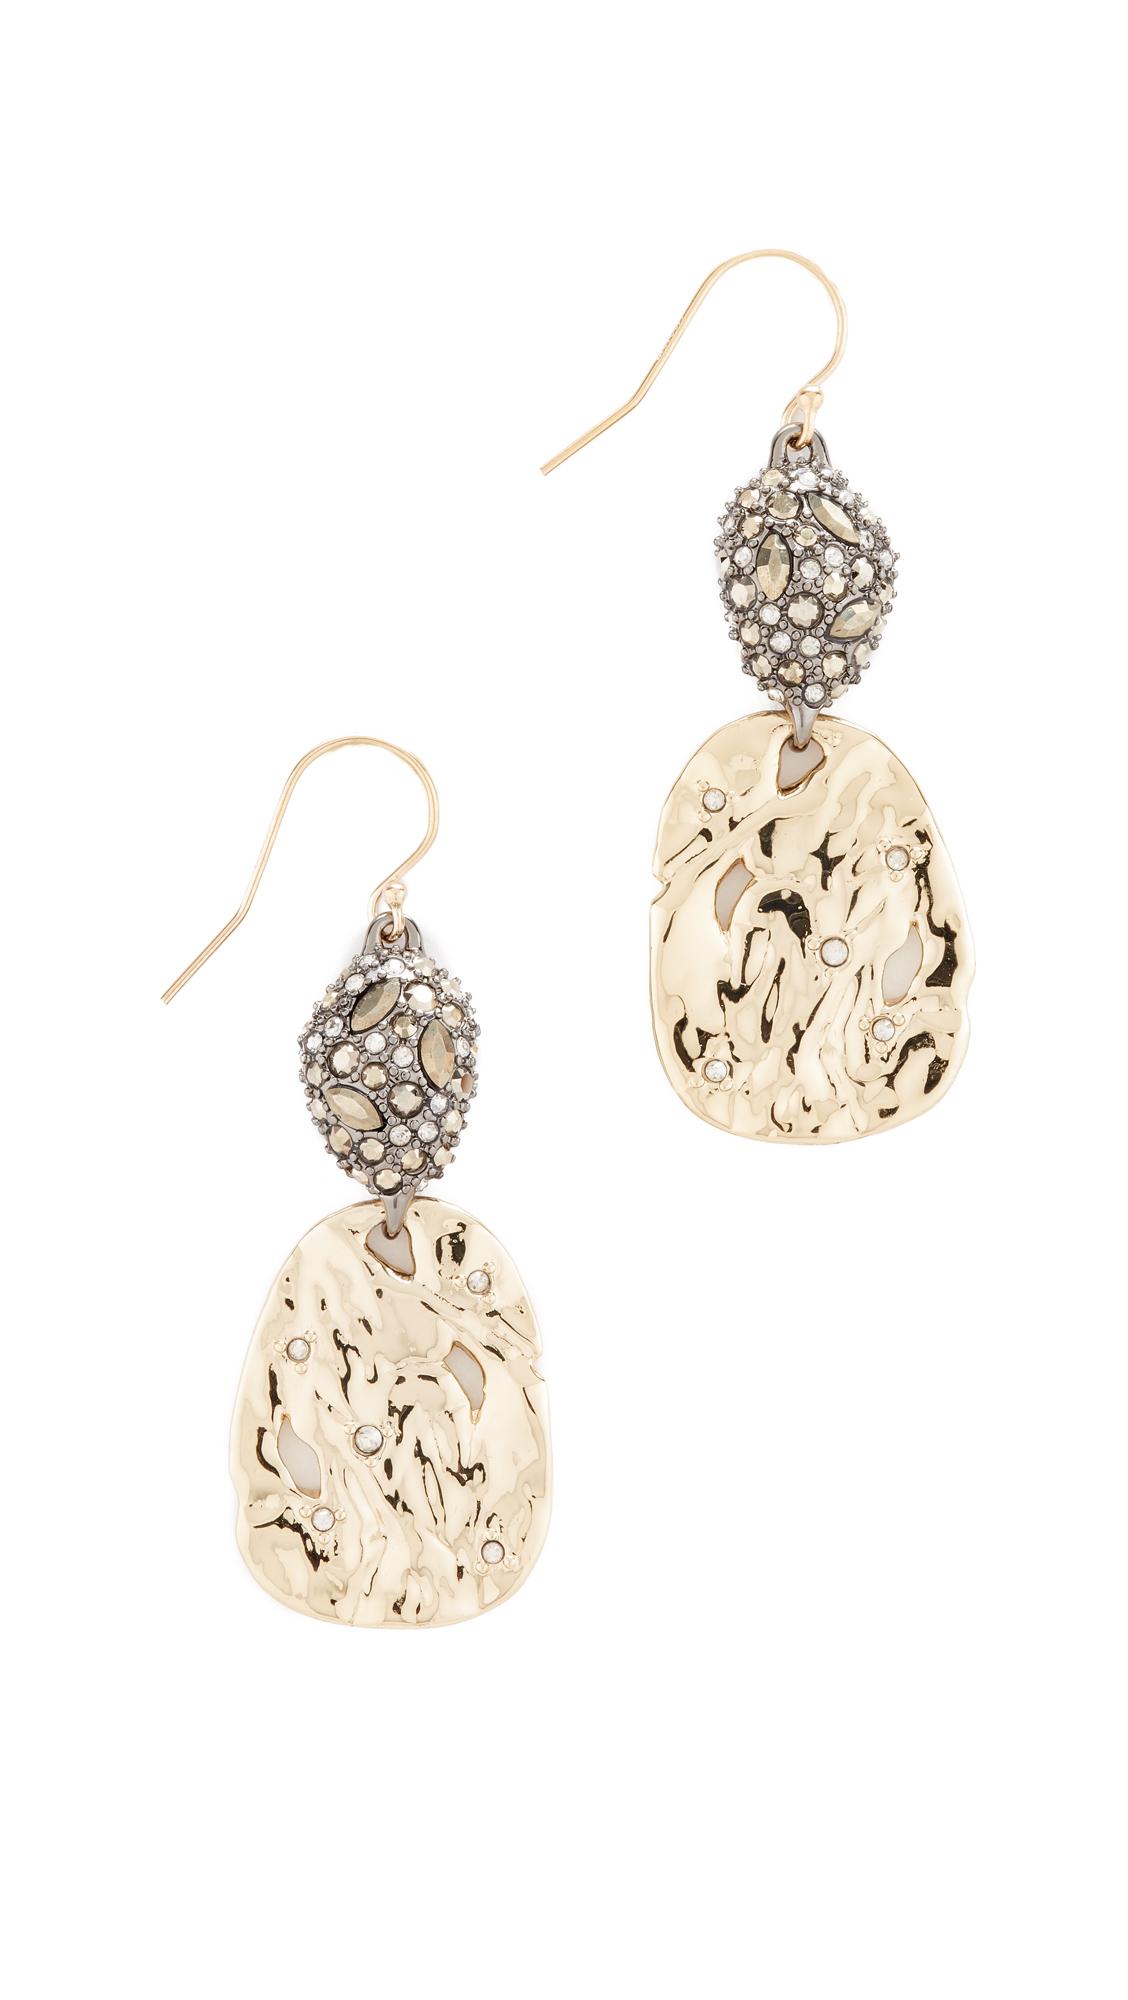 Alexis Bittar Hammered Crystal Earrings